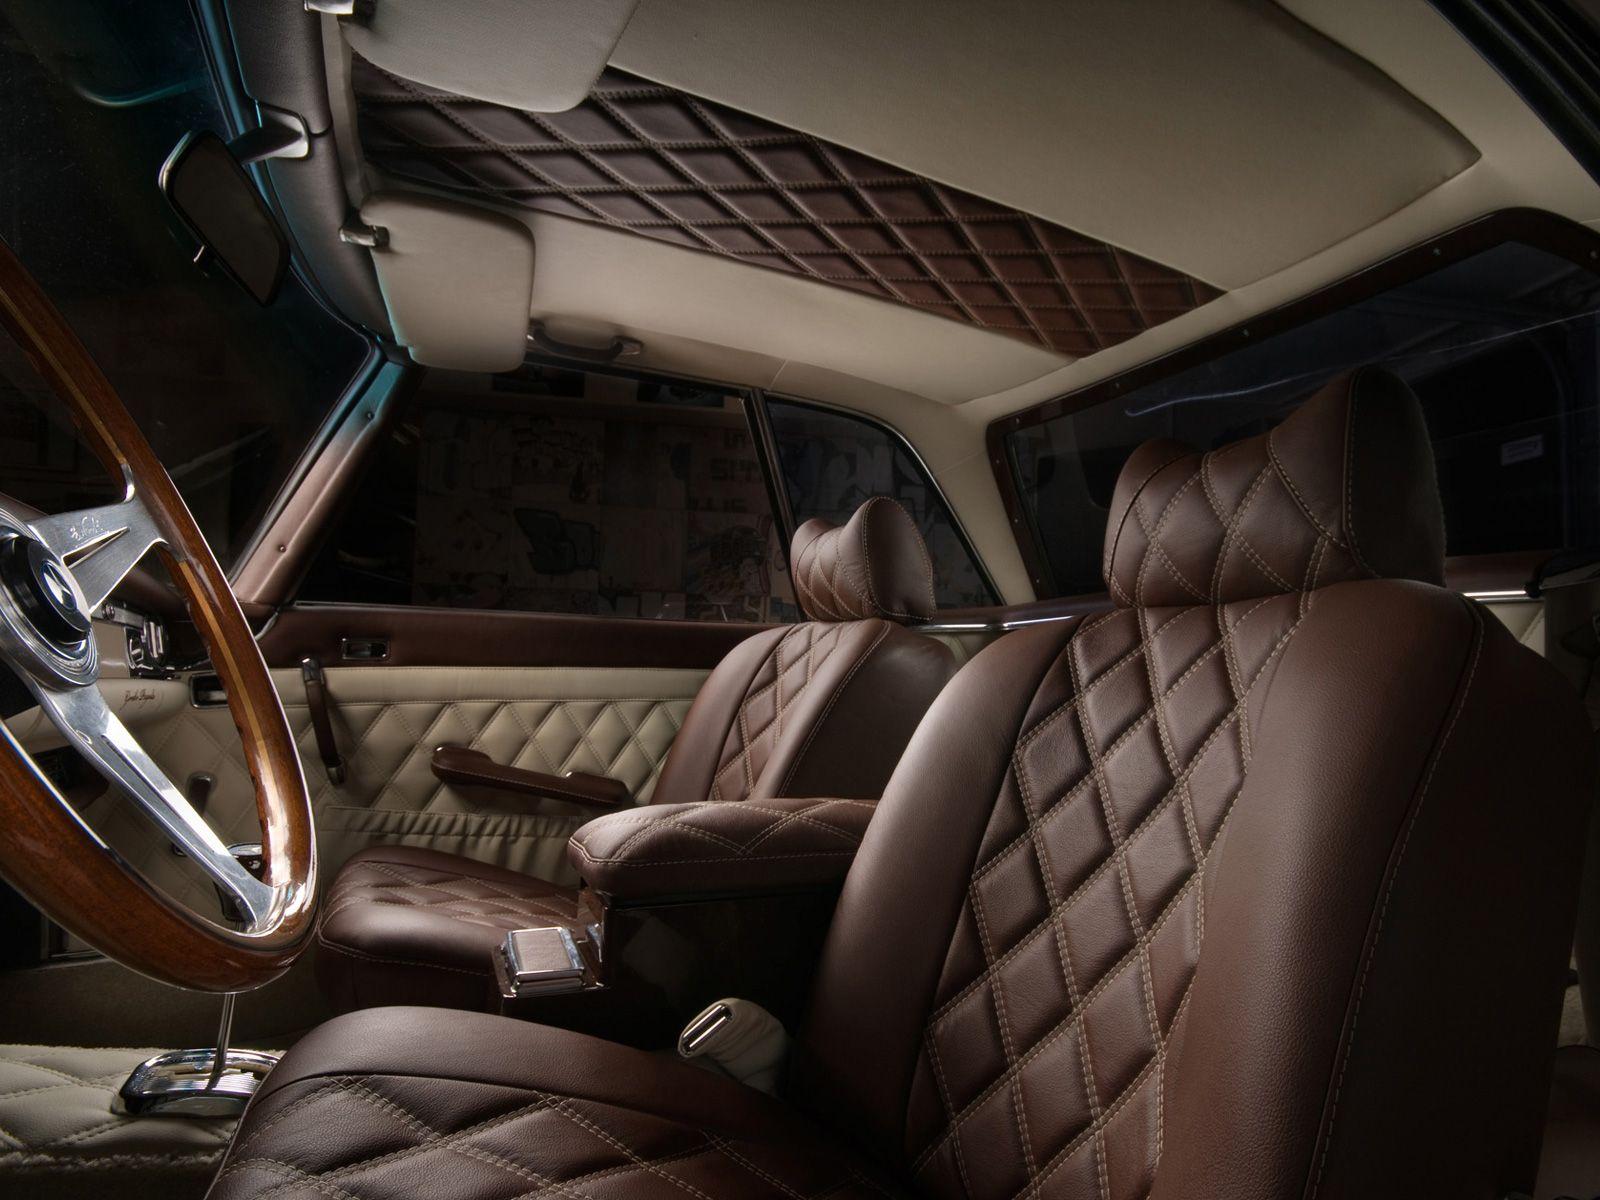 Lexus lf gh concept 2011 exterior detail 49 of 49 1600x1200 - 1963 Mercedes Benz W113 Gentle Pagoda By Vilner Studio Seats 1600x1200